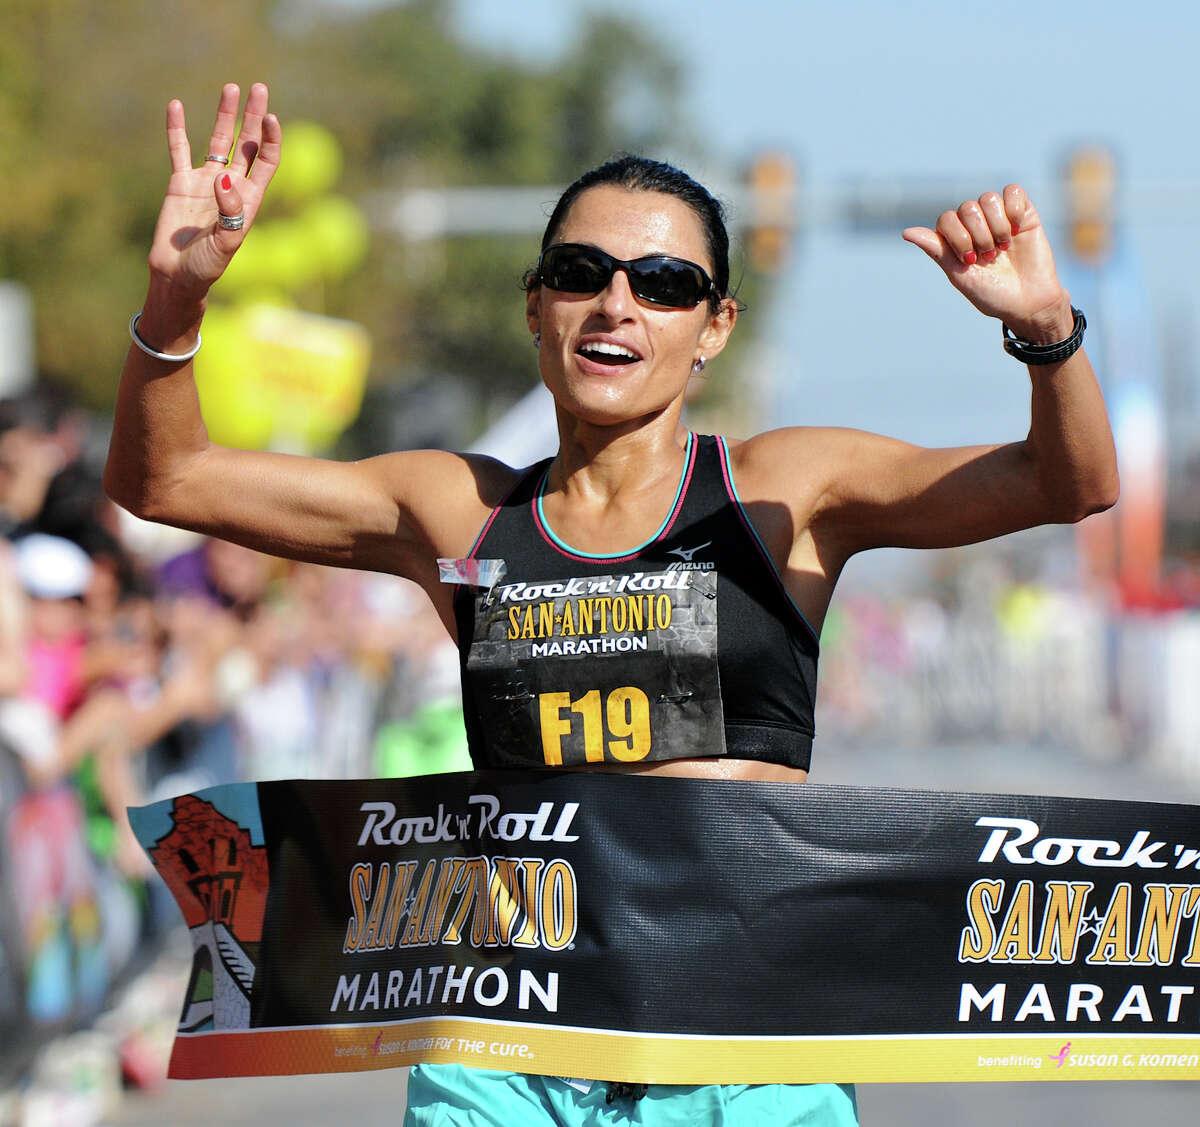 Marathon (Women) 11/13/11 - Liza Hunter-Galvan: 02:46:55